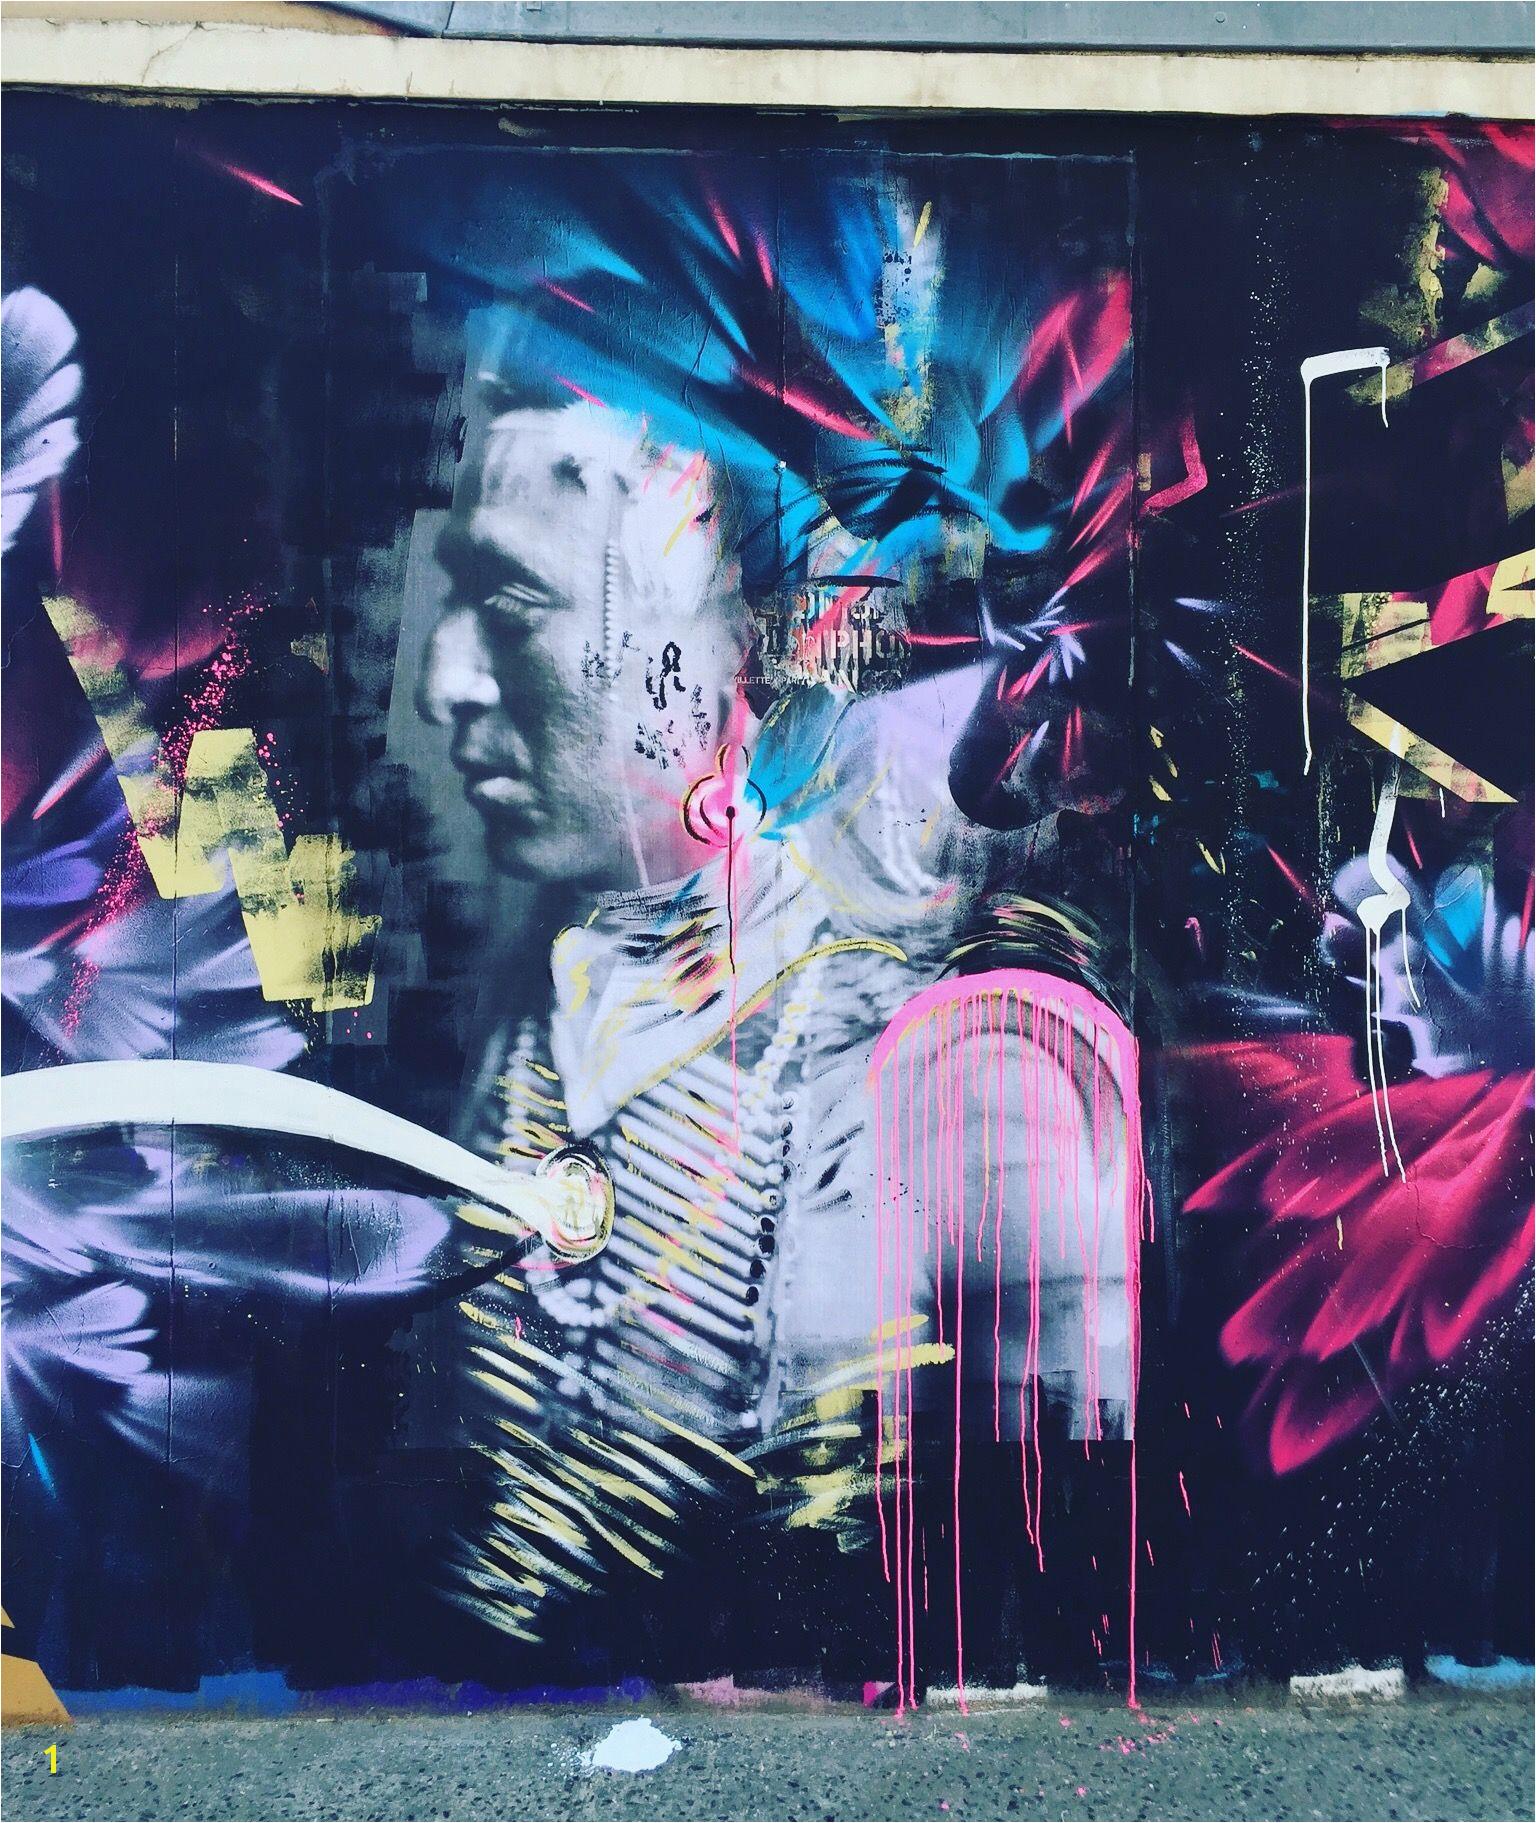 Indian Spirit Voodoo by joachimromain joachimromain streetart graffiti graff spray ing wall instagraff urbanart graffitiwall urbanwalls